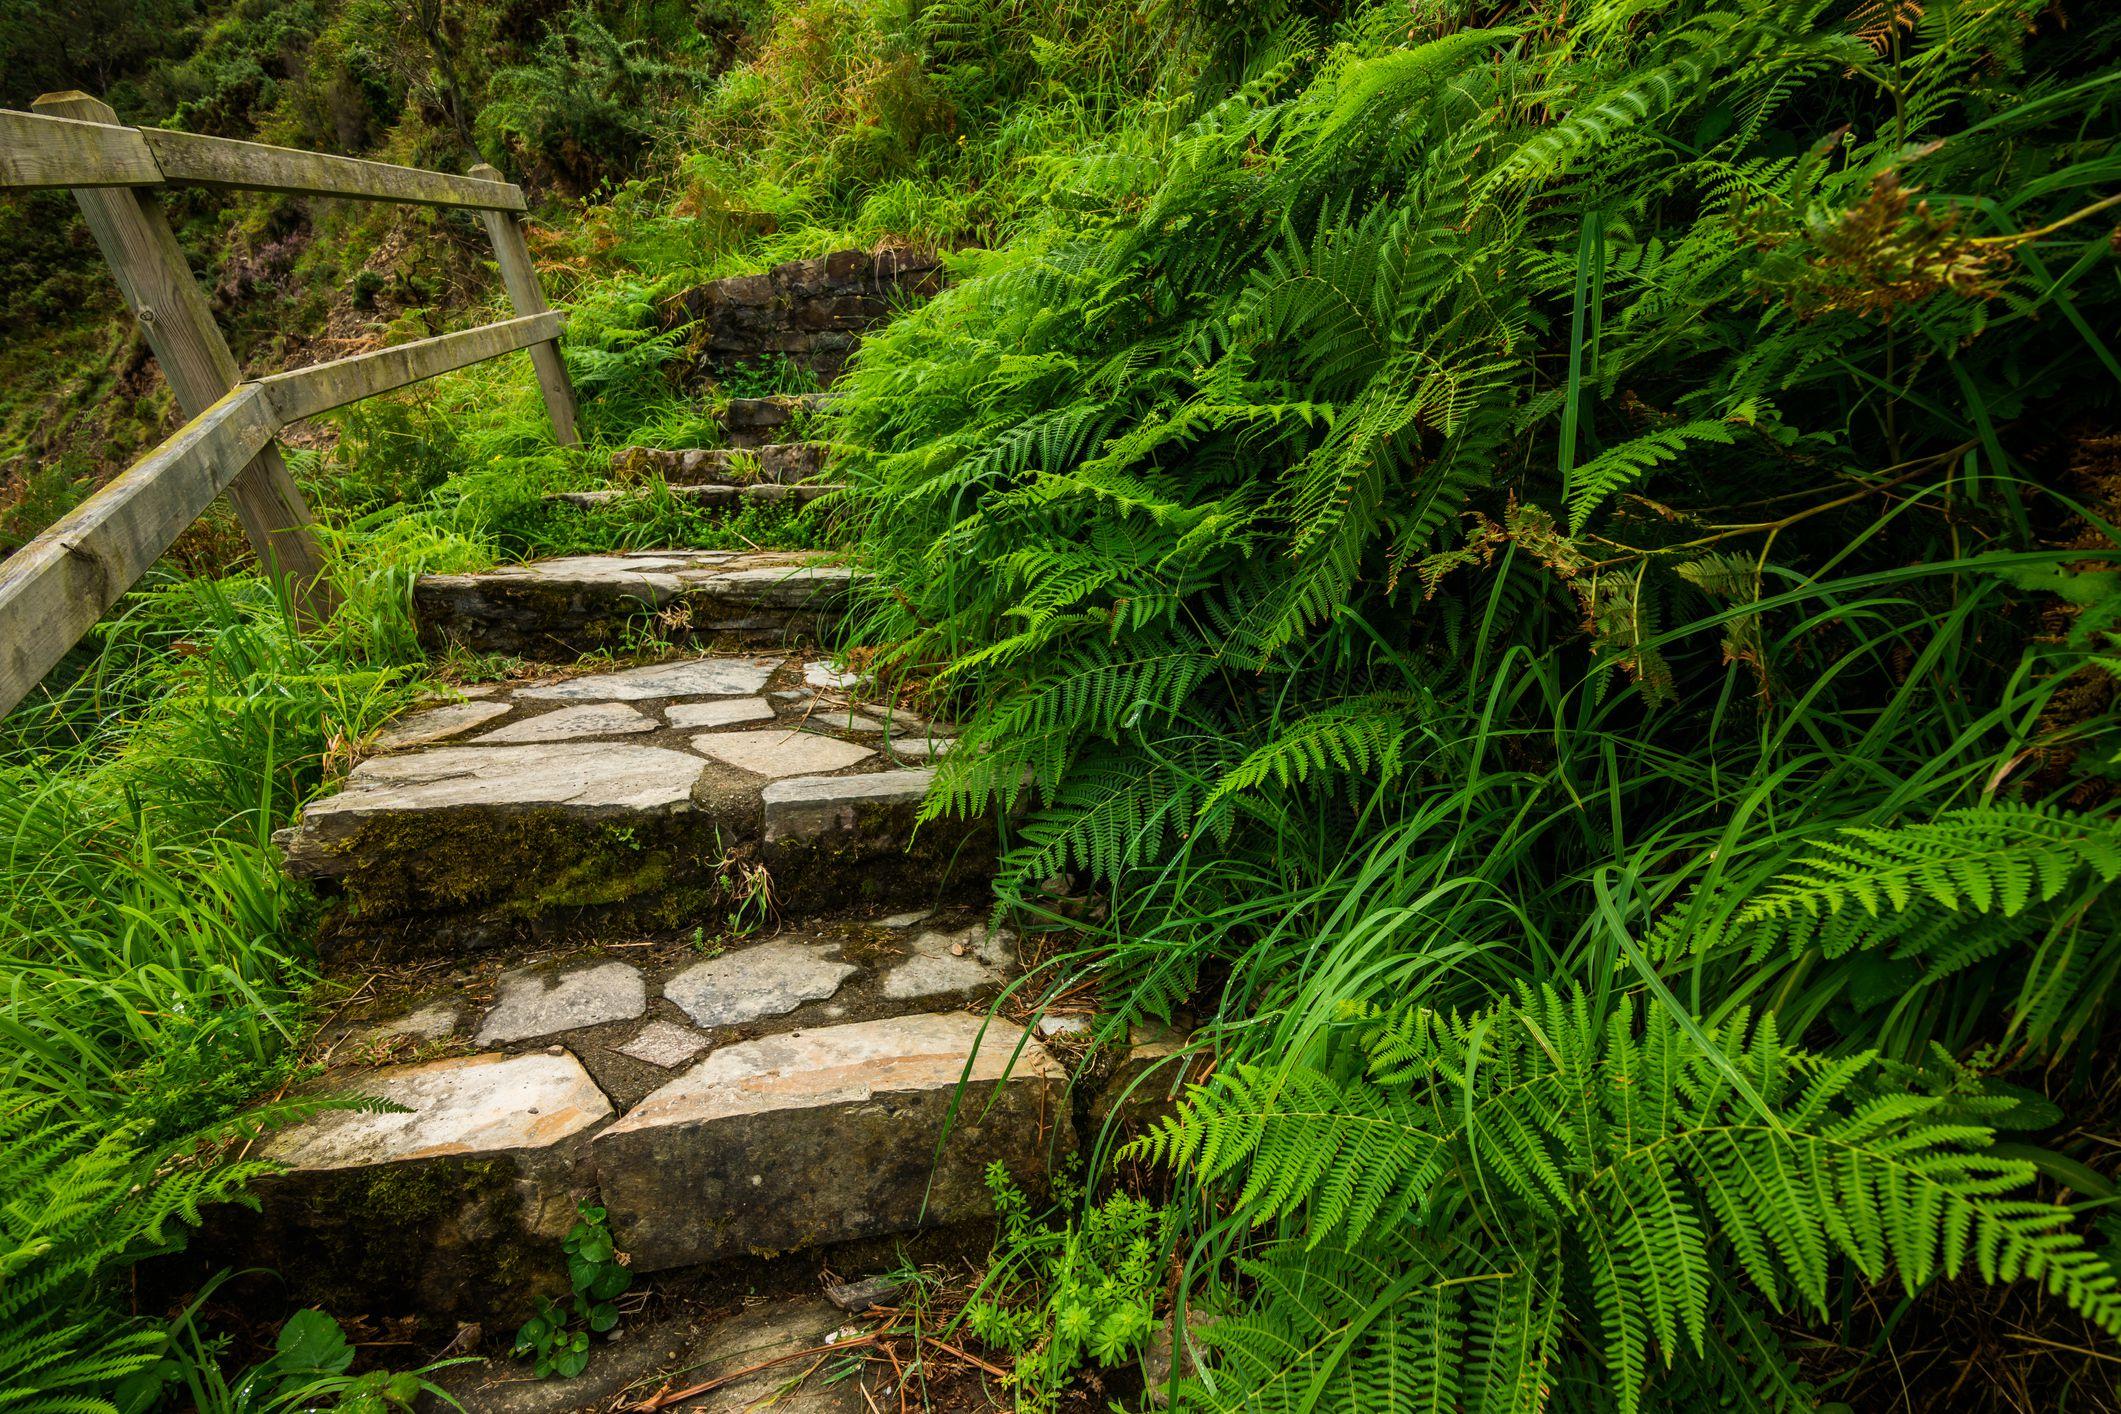 Staircase in green fern. Asturias, Spain